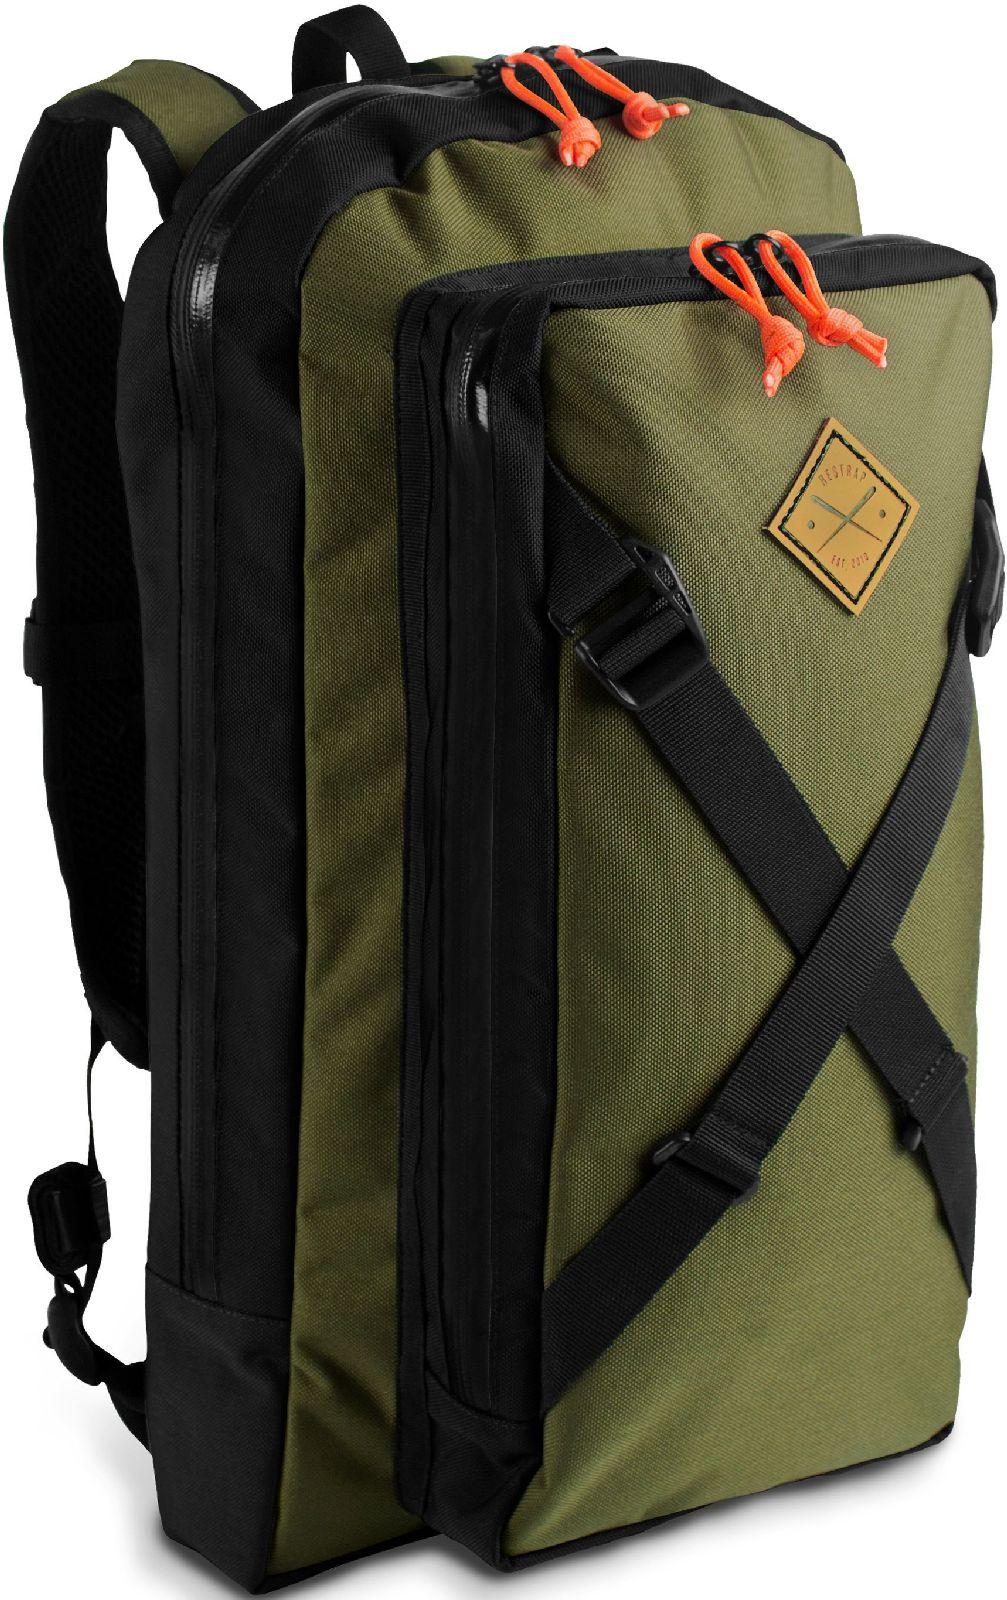 Restrap Sub Backpack - Olive/Black uni